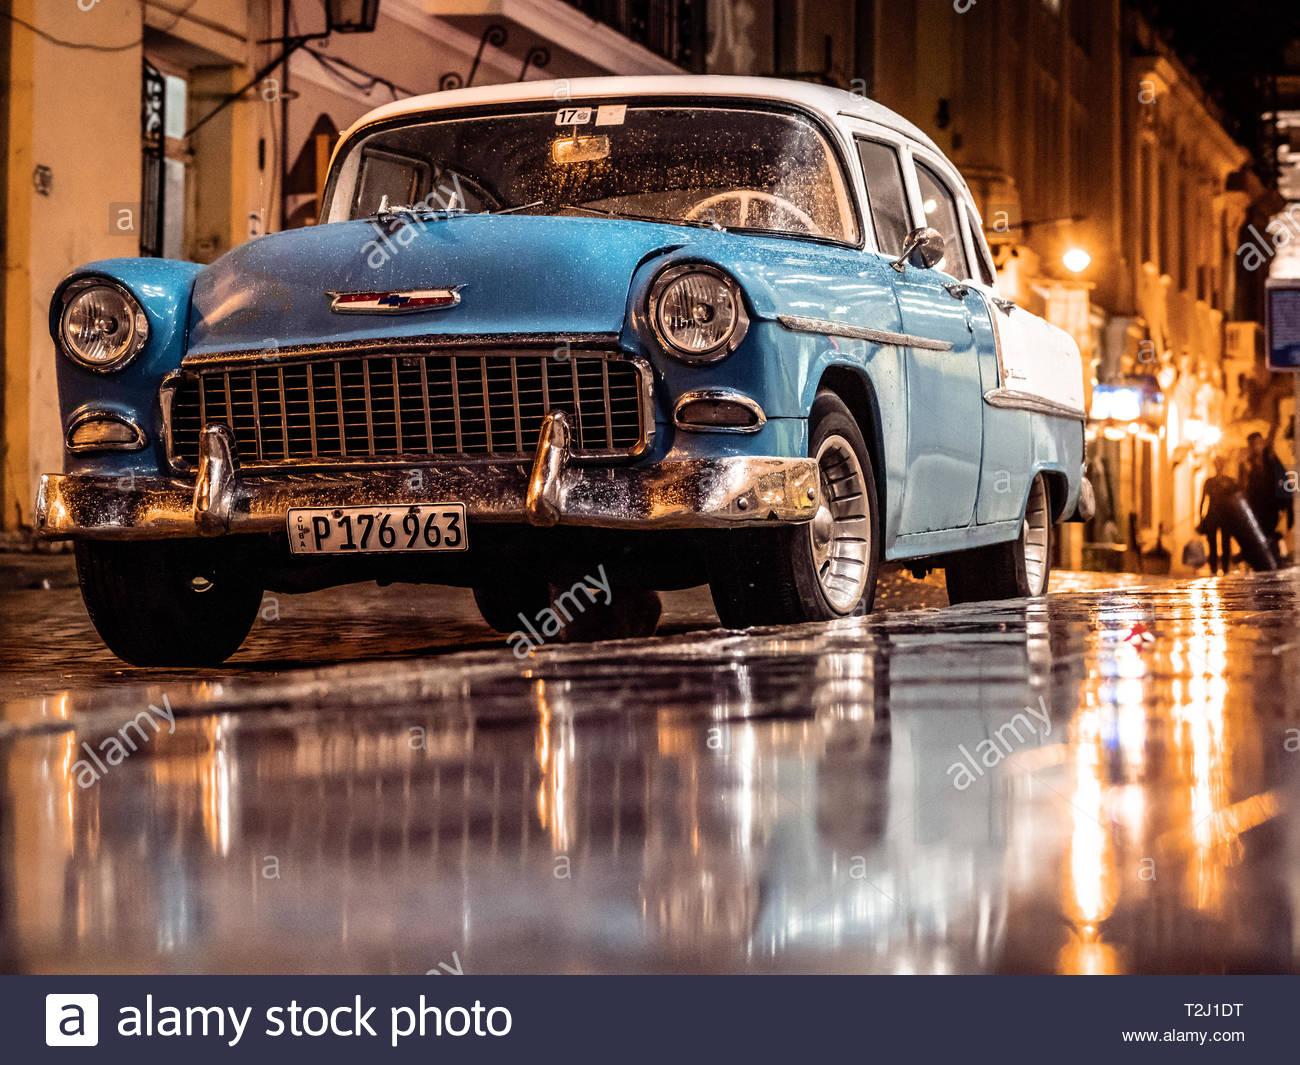 La Habana Vieja. Cuba - Stock Image